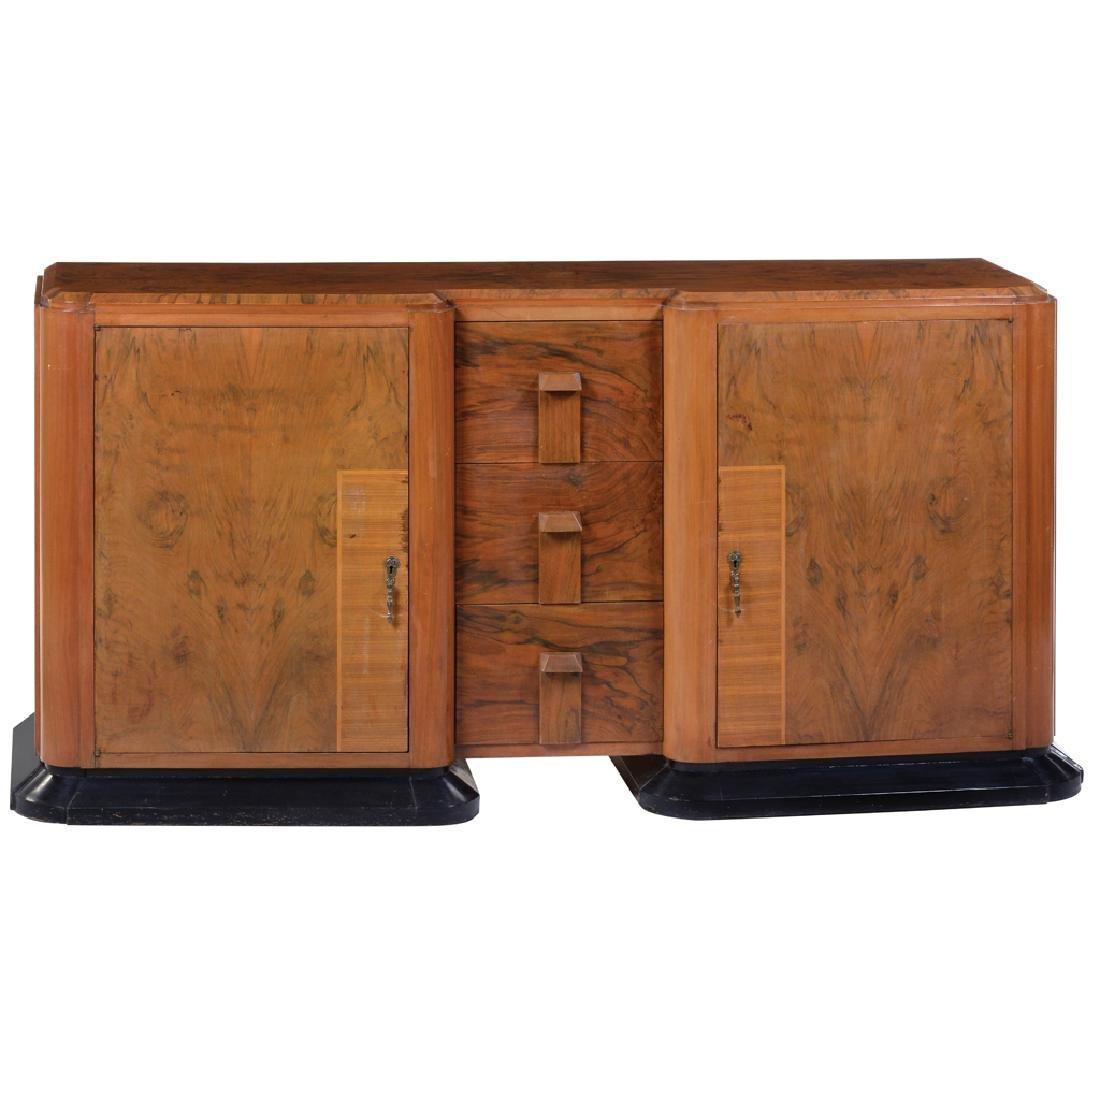 art Deco style root wood bureau with 2 doors, 3 drawers